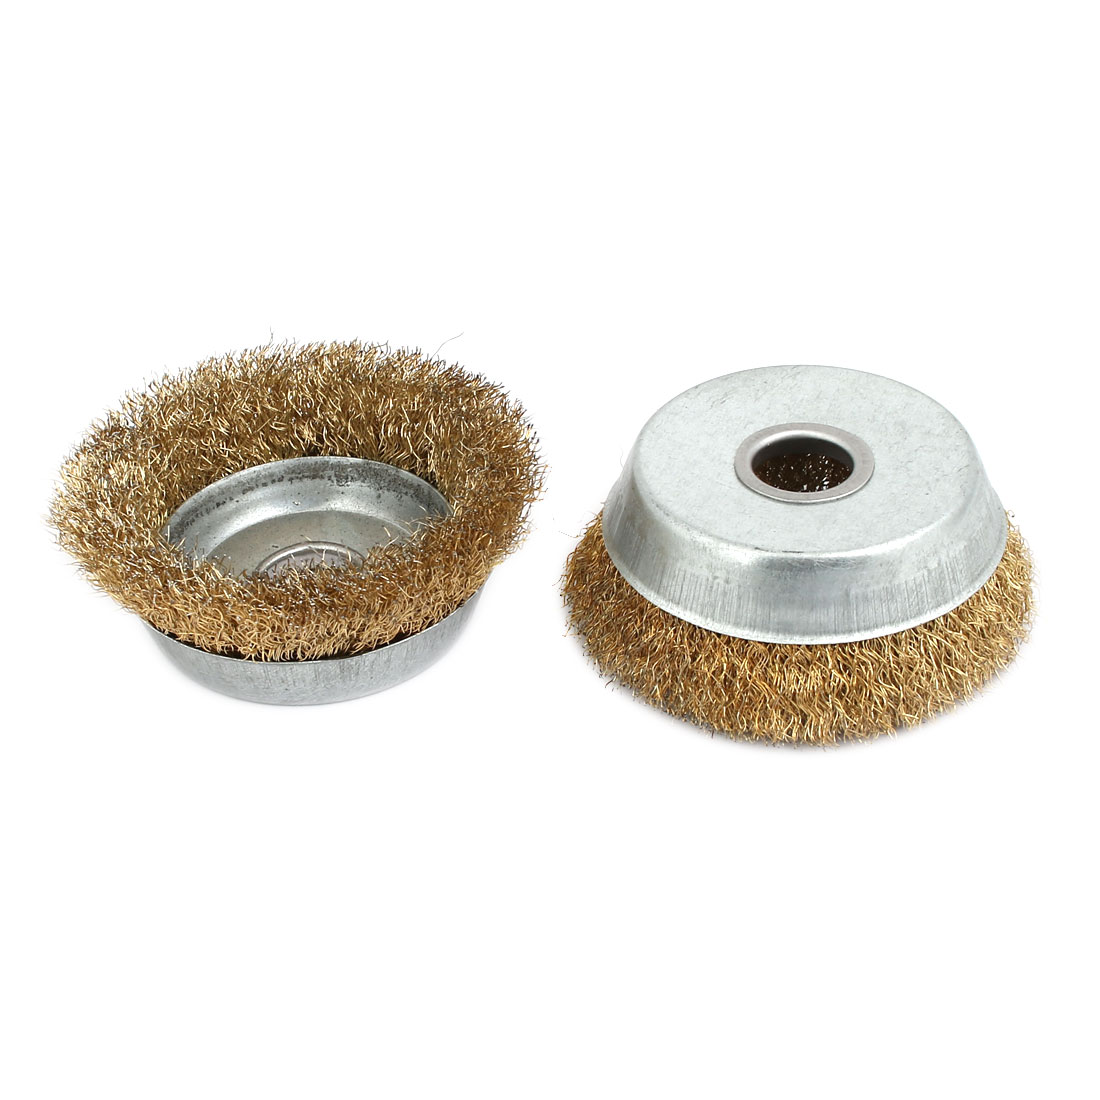 3-inch Dia Bronze Tone Polishing Wheel Buffing Tool Cup Wire Brush 2pcs